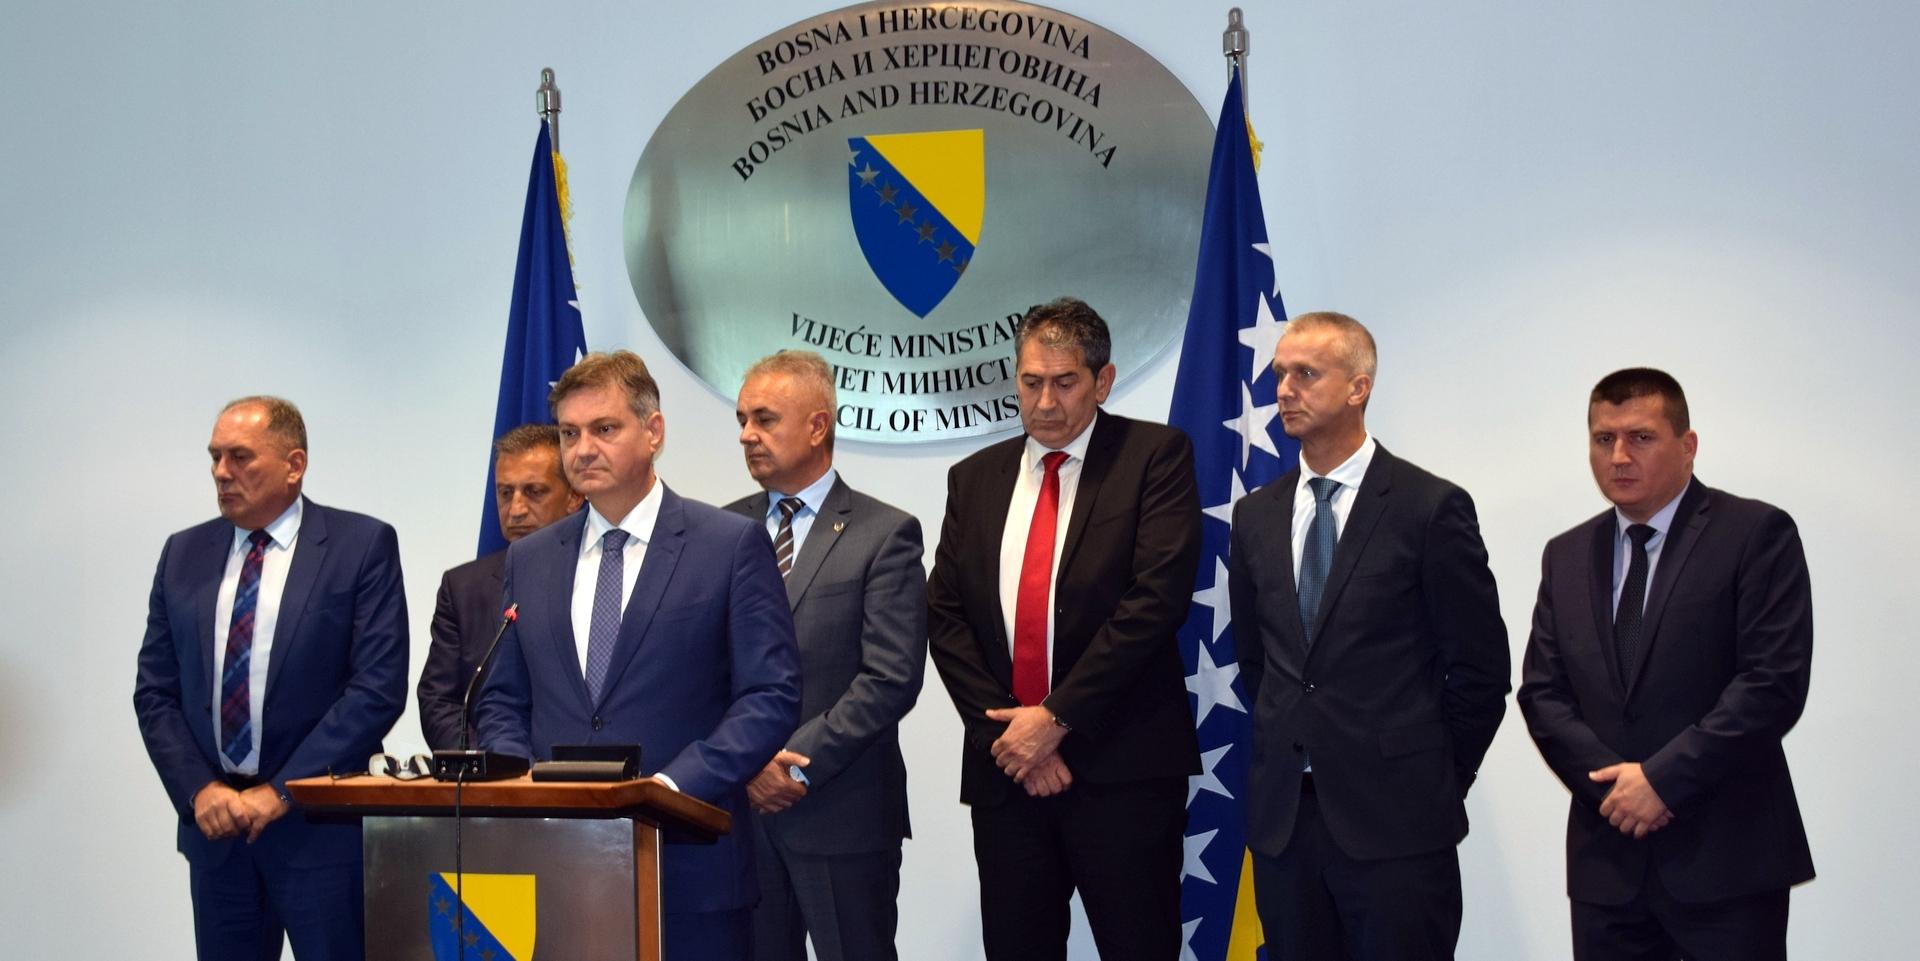 BiH is not a terrorist base, officials say